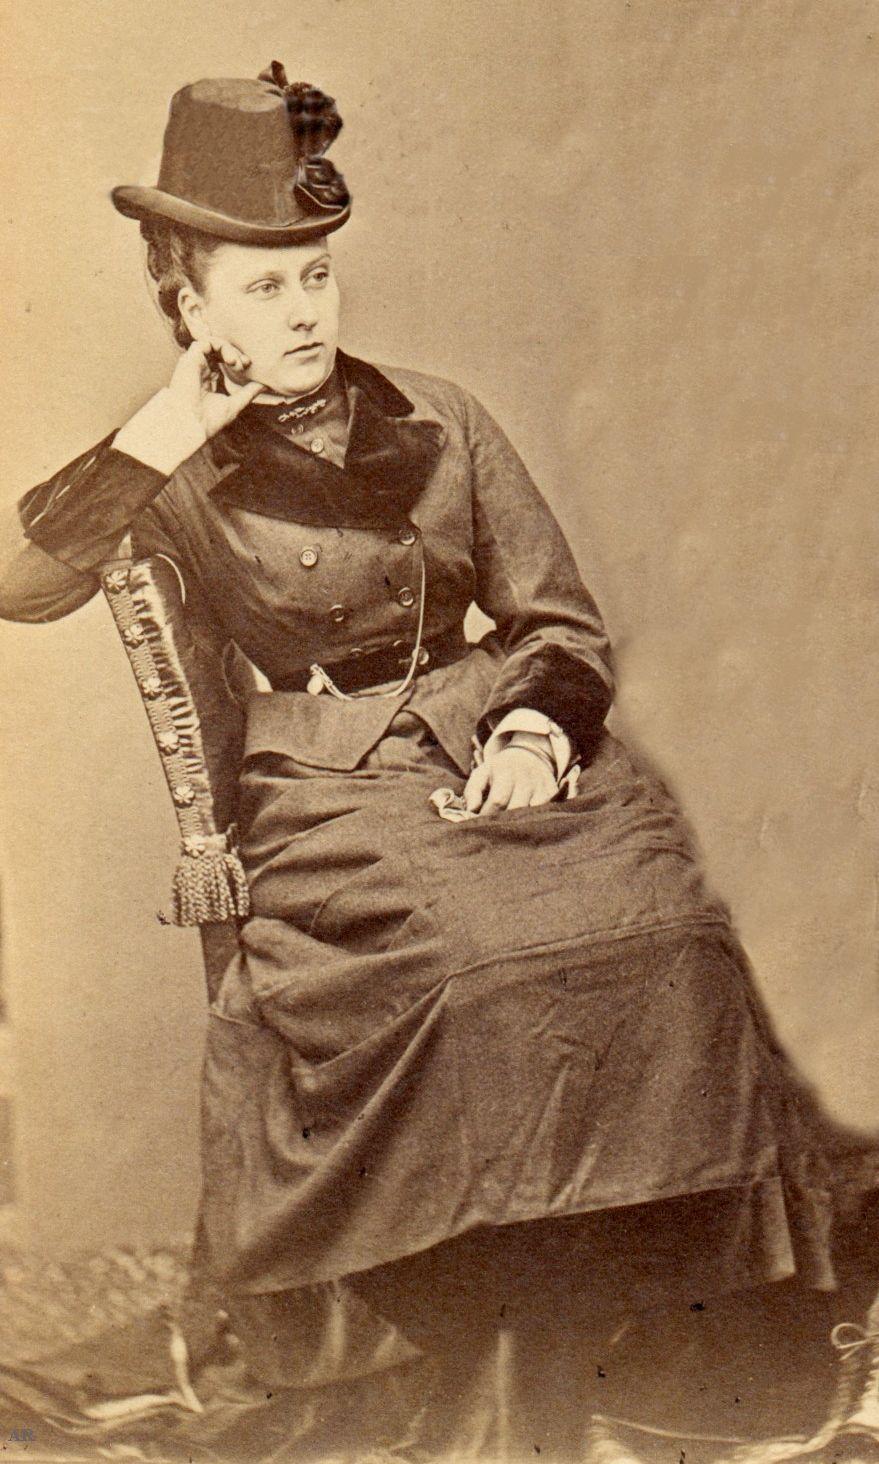 Princess Beatrice of the United Kingdom, later Princess